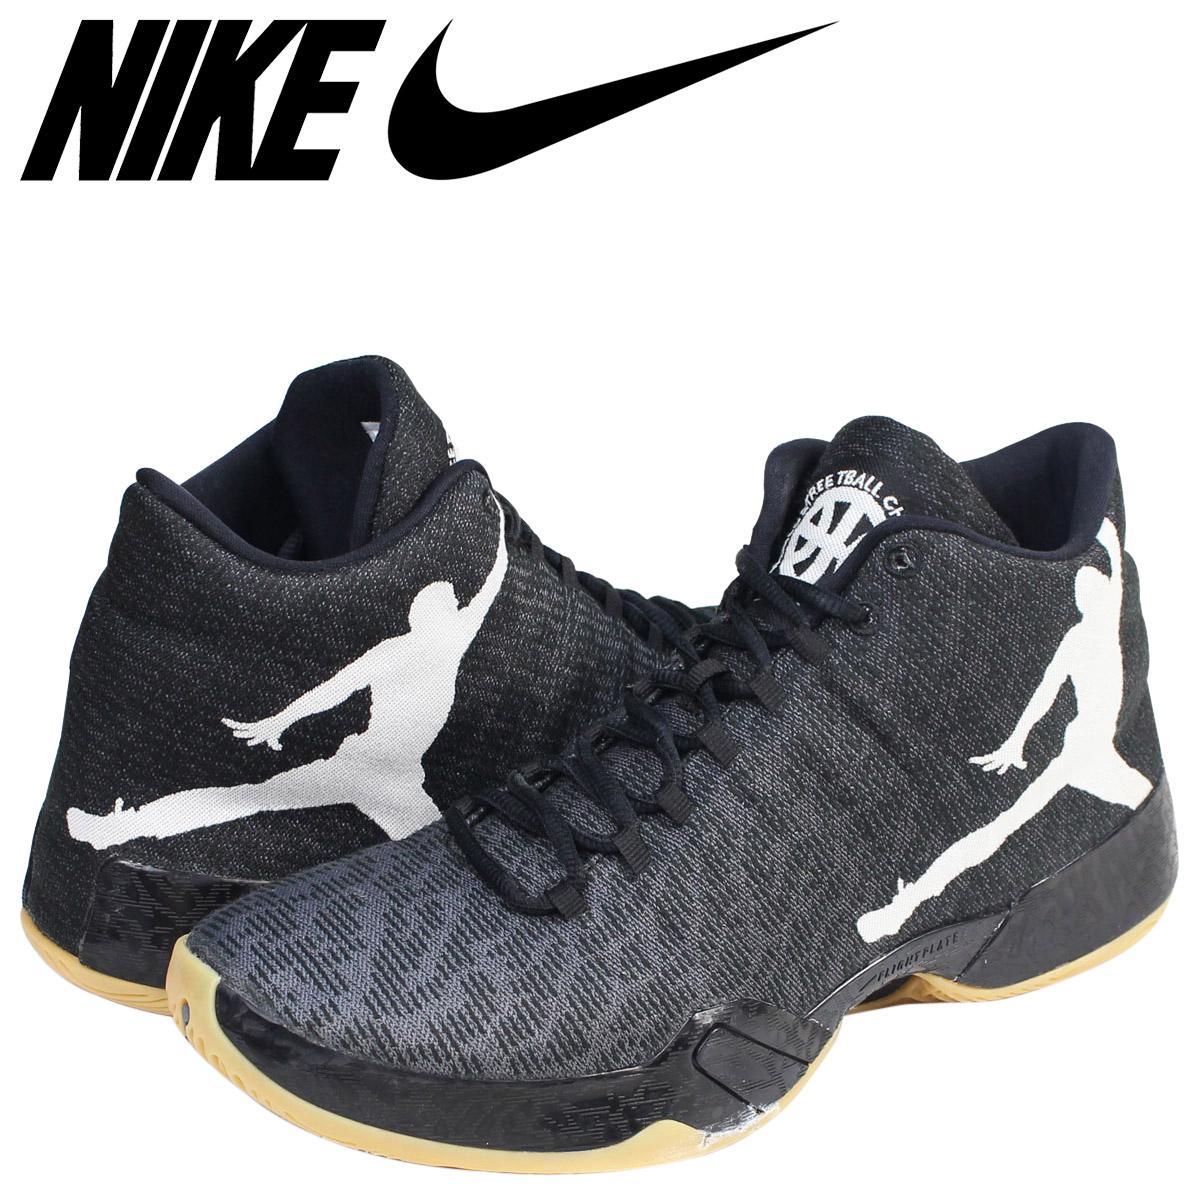 huge discount e6eb8 47b05 Nike NIKE Air Jordan 29 sneakers AIR JORDAN XX9 QUAI 54 805,254-004 men's  shoes black